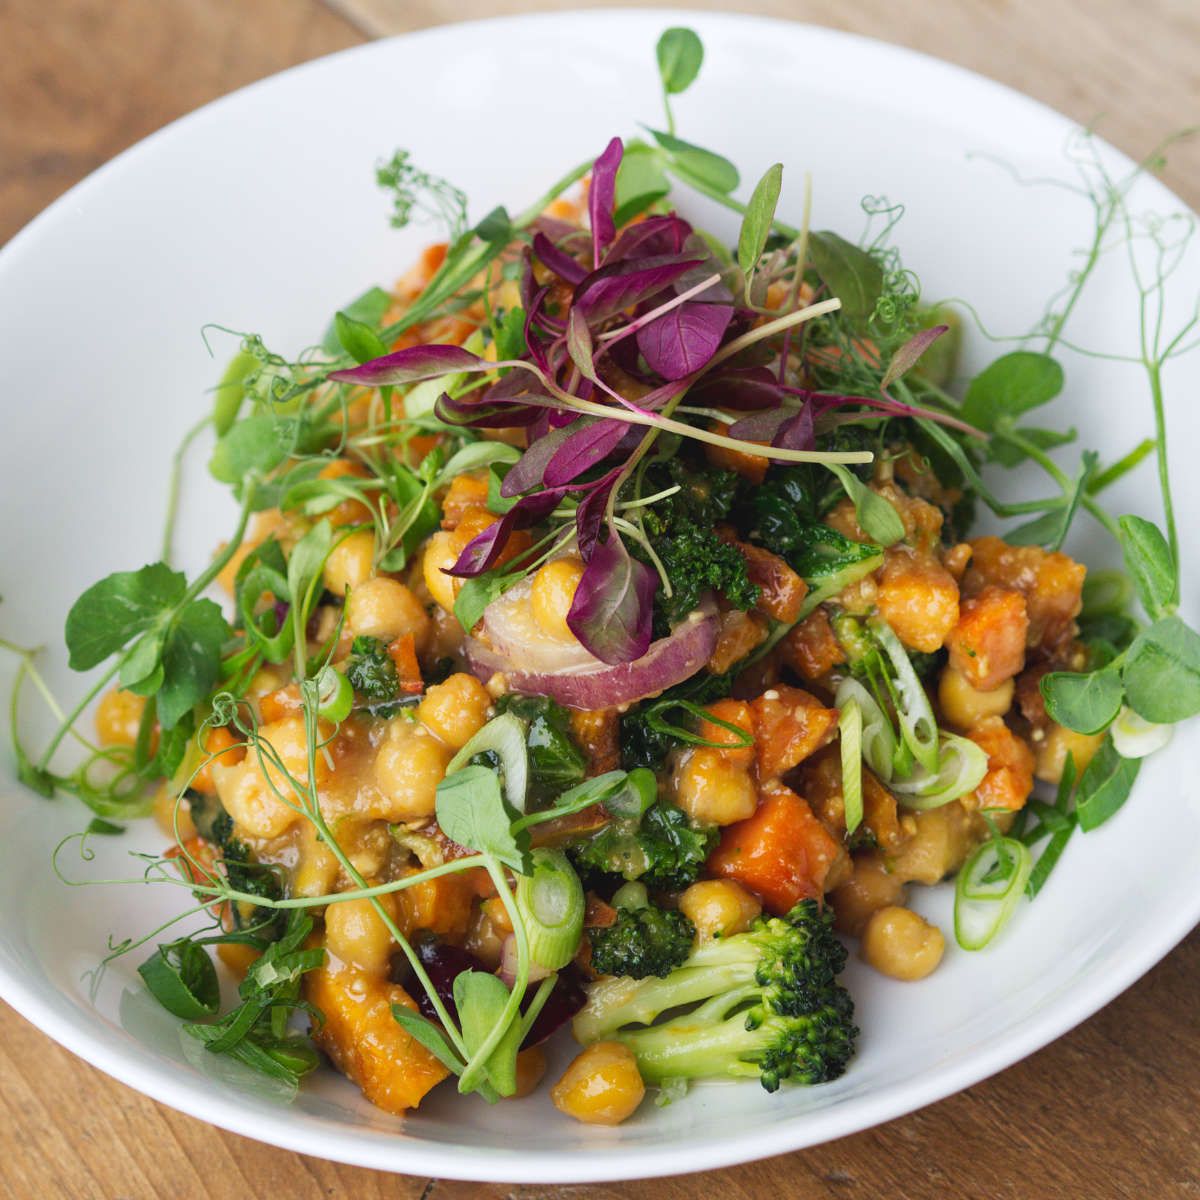 Vegan chickpea bowl at Kcal Kitchen, Edinburgh